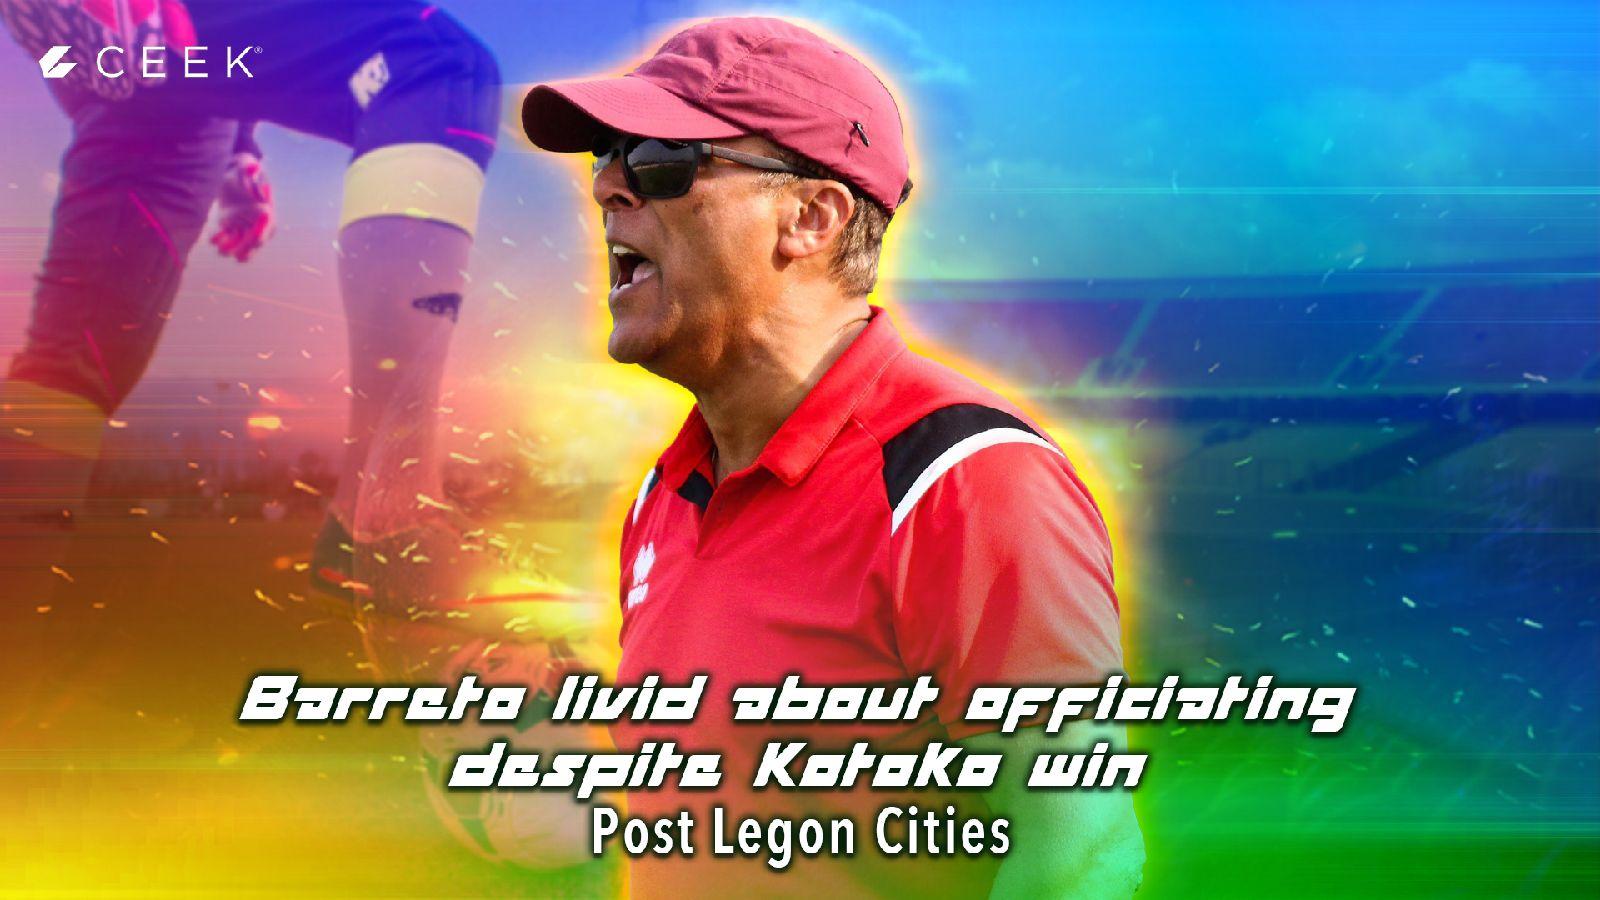 Barreto livid about officiating despite Kotoko win | Post Legon Cities